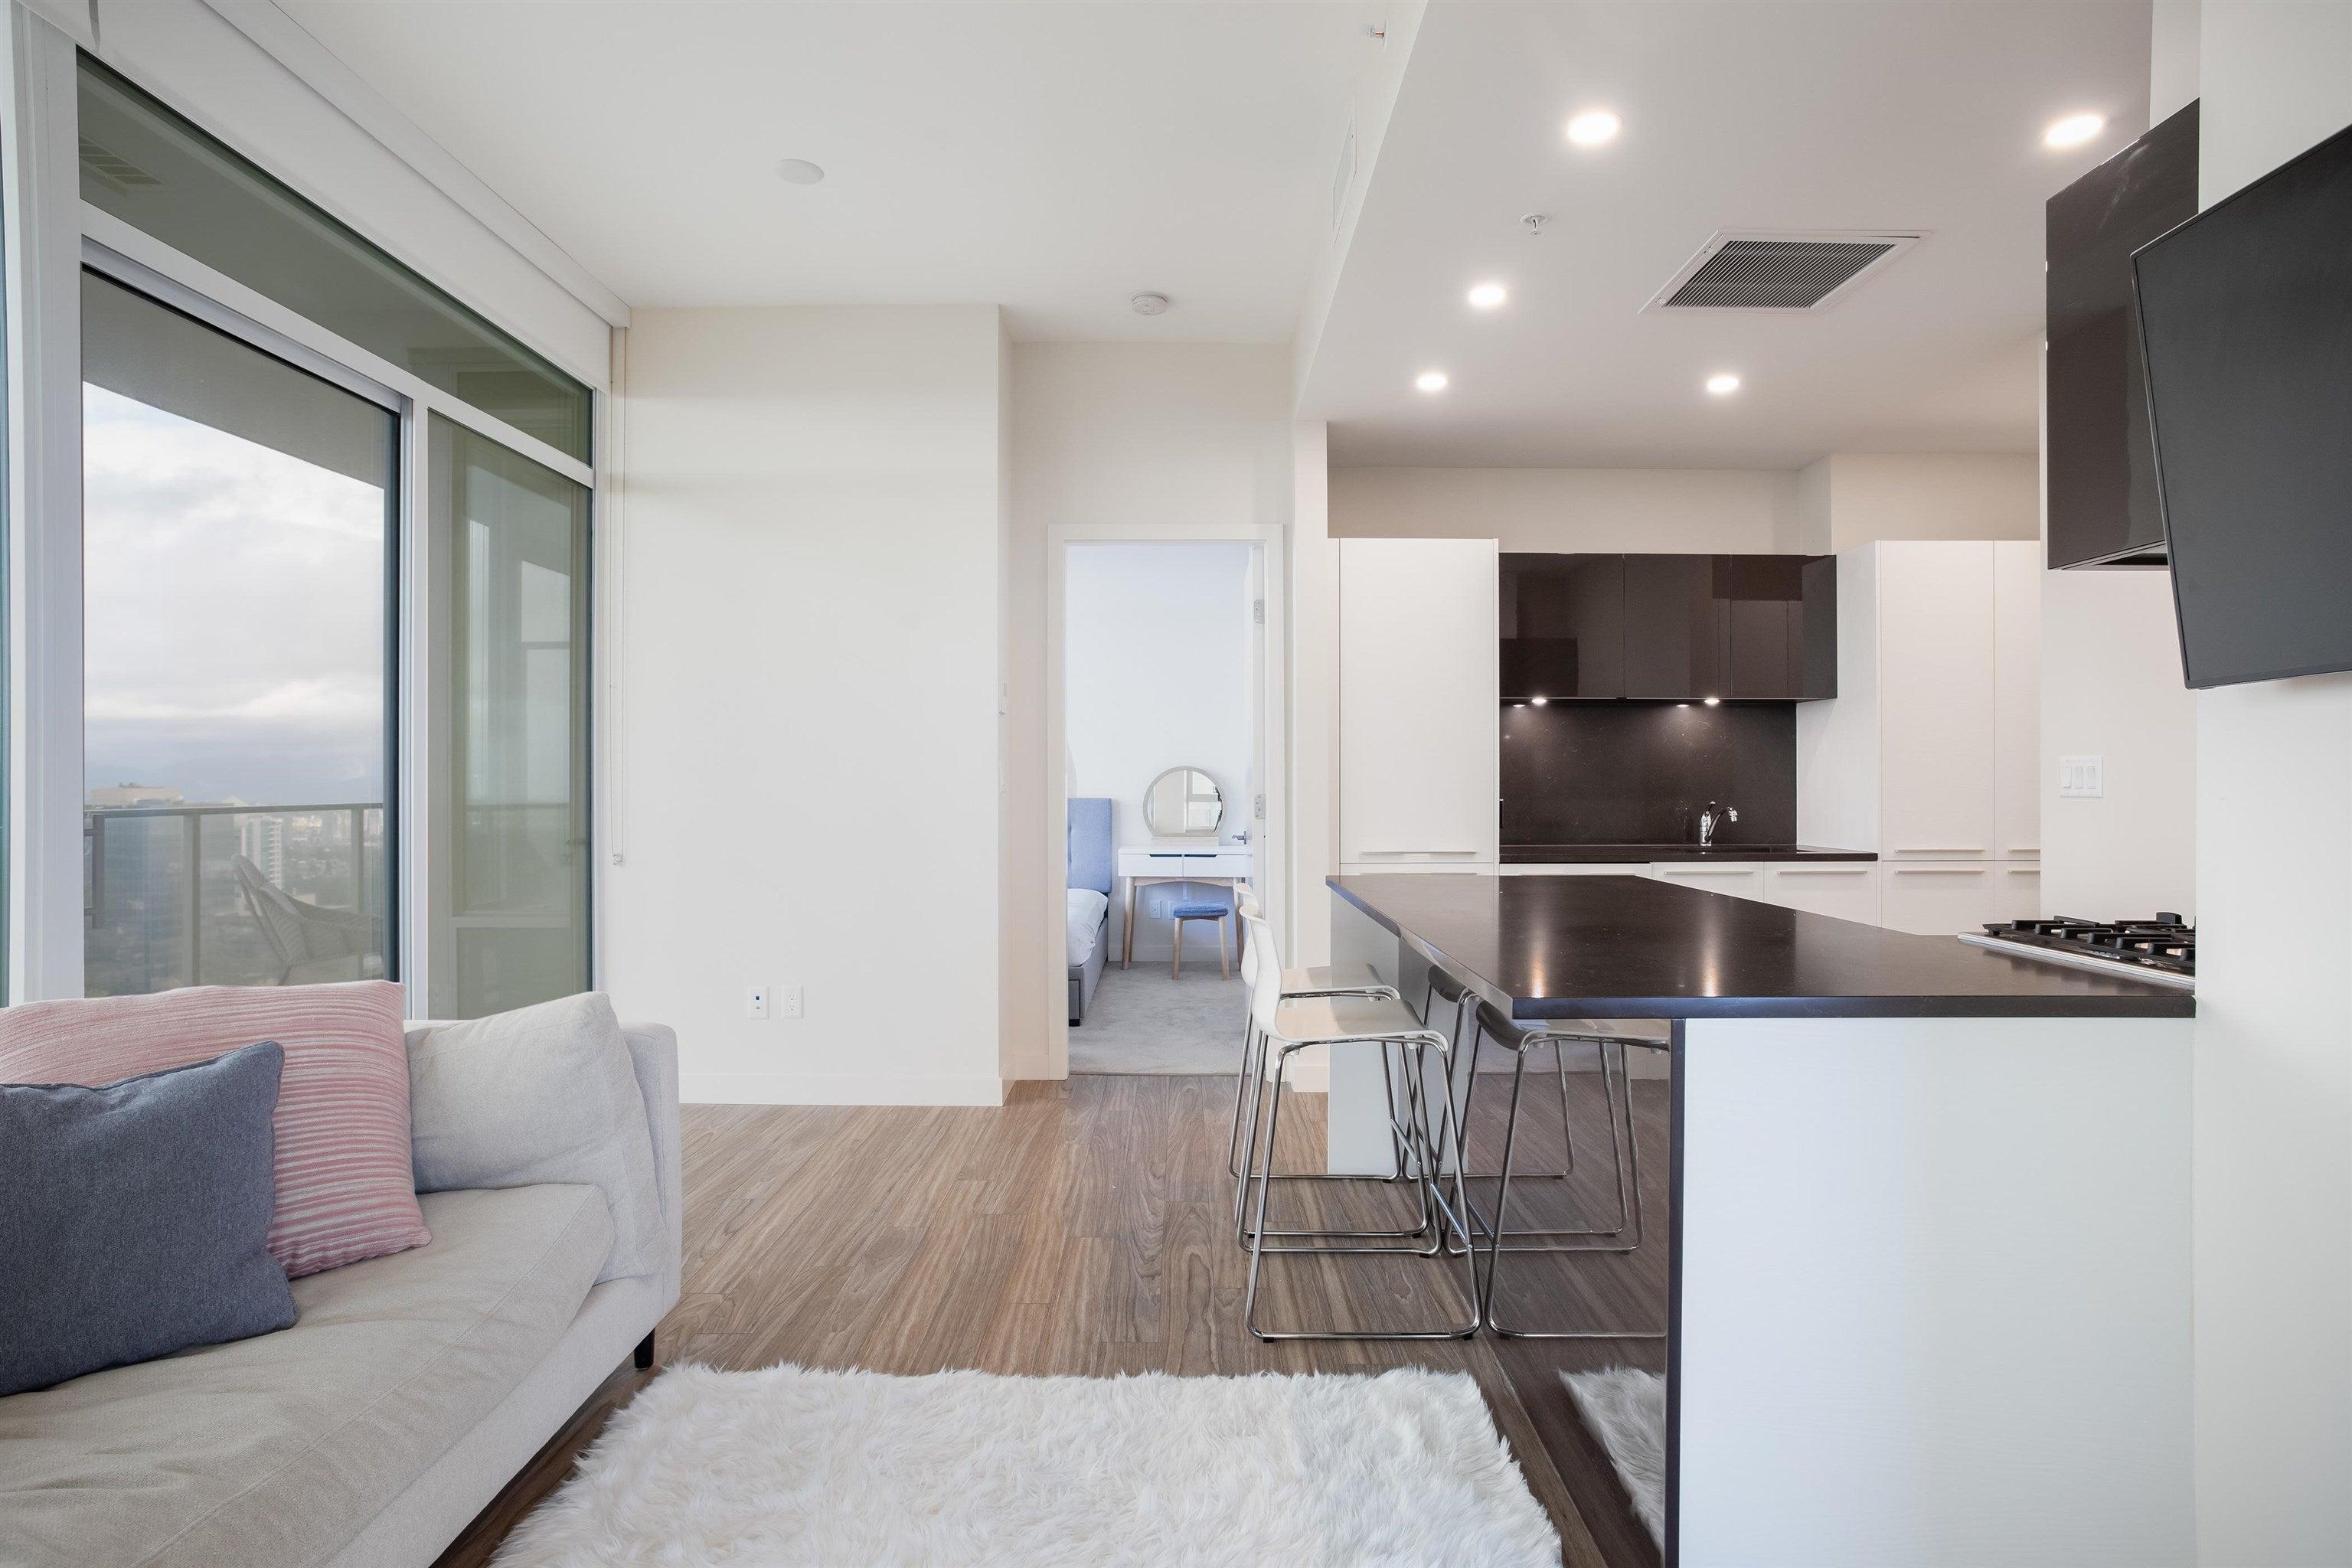 2206 6383 MCKAY AVENUE - Metrotown Apartment/Condo for sale, 2 Bedrooms (R2625647) - #5